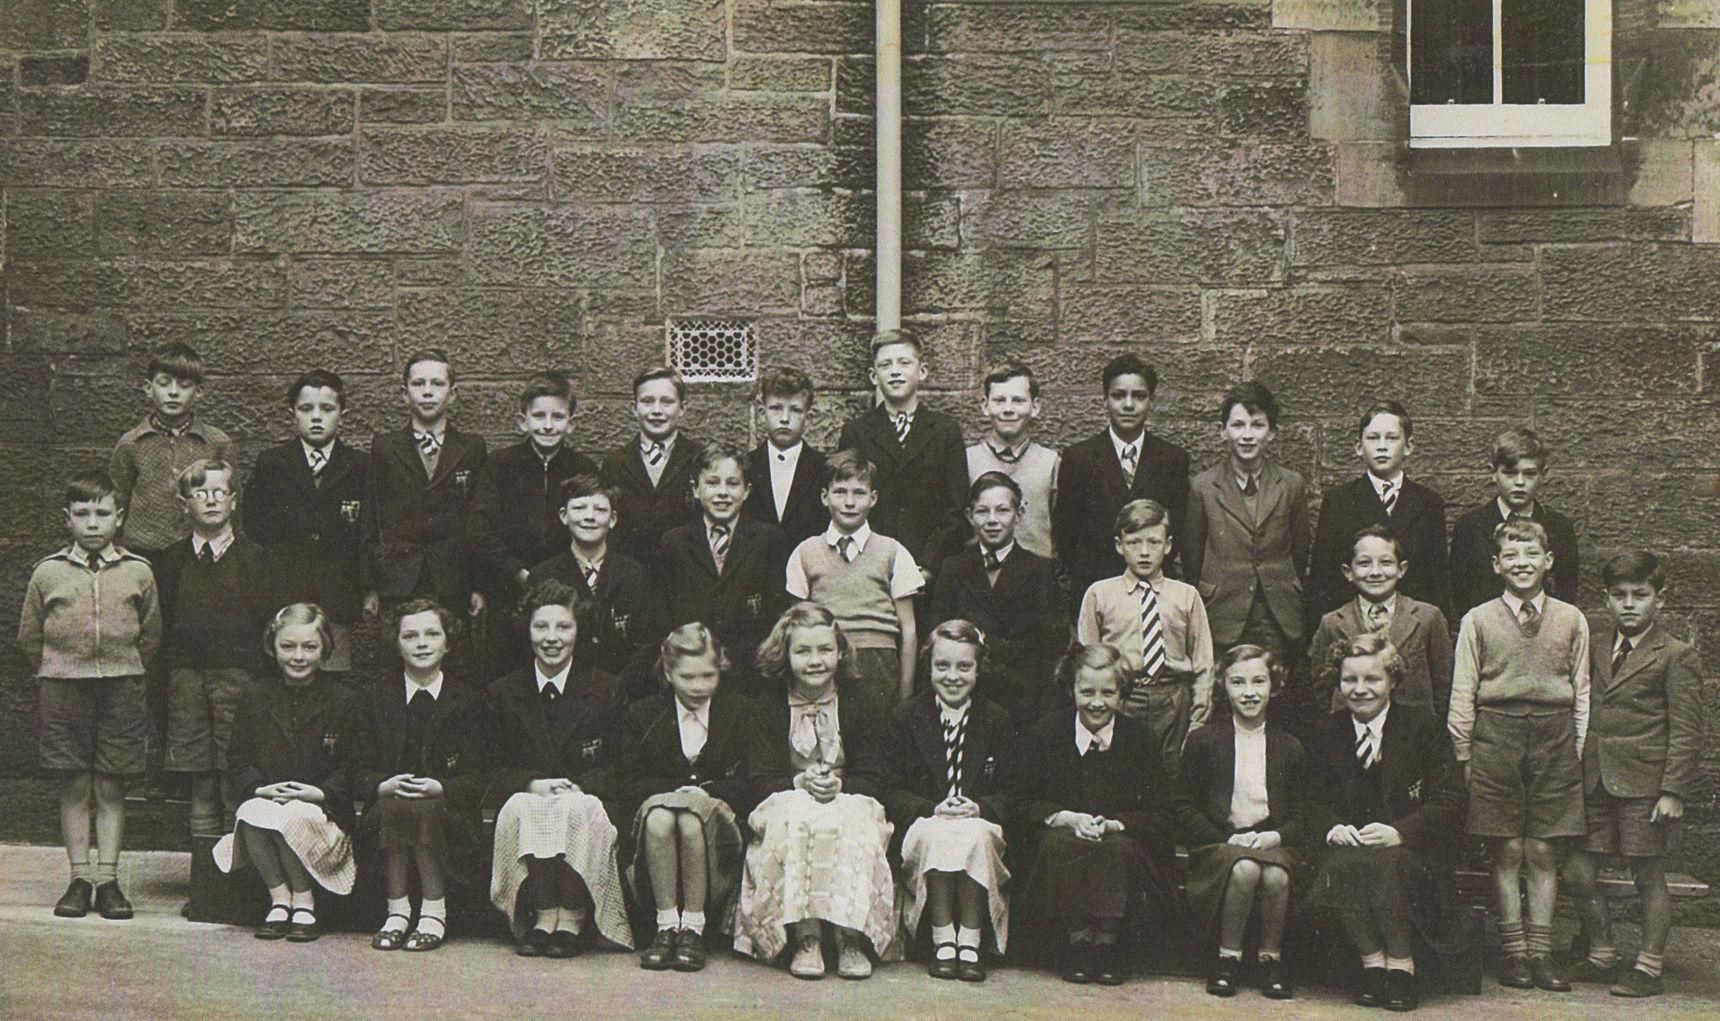 1956 - My Dean School Class Photo.